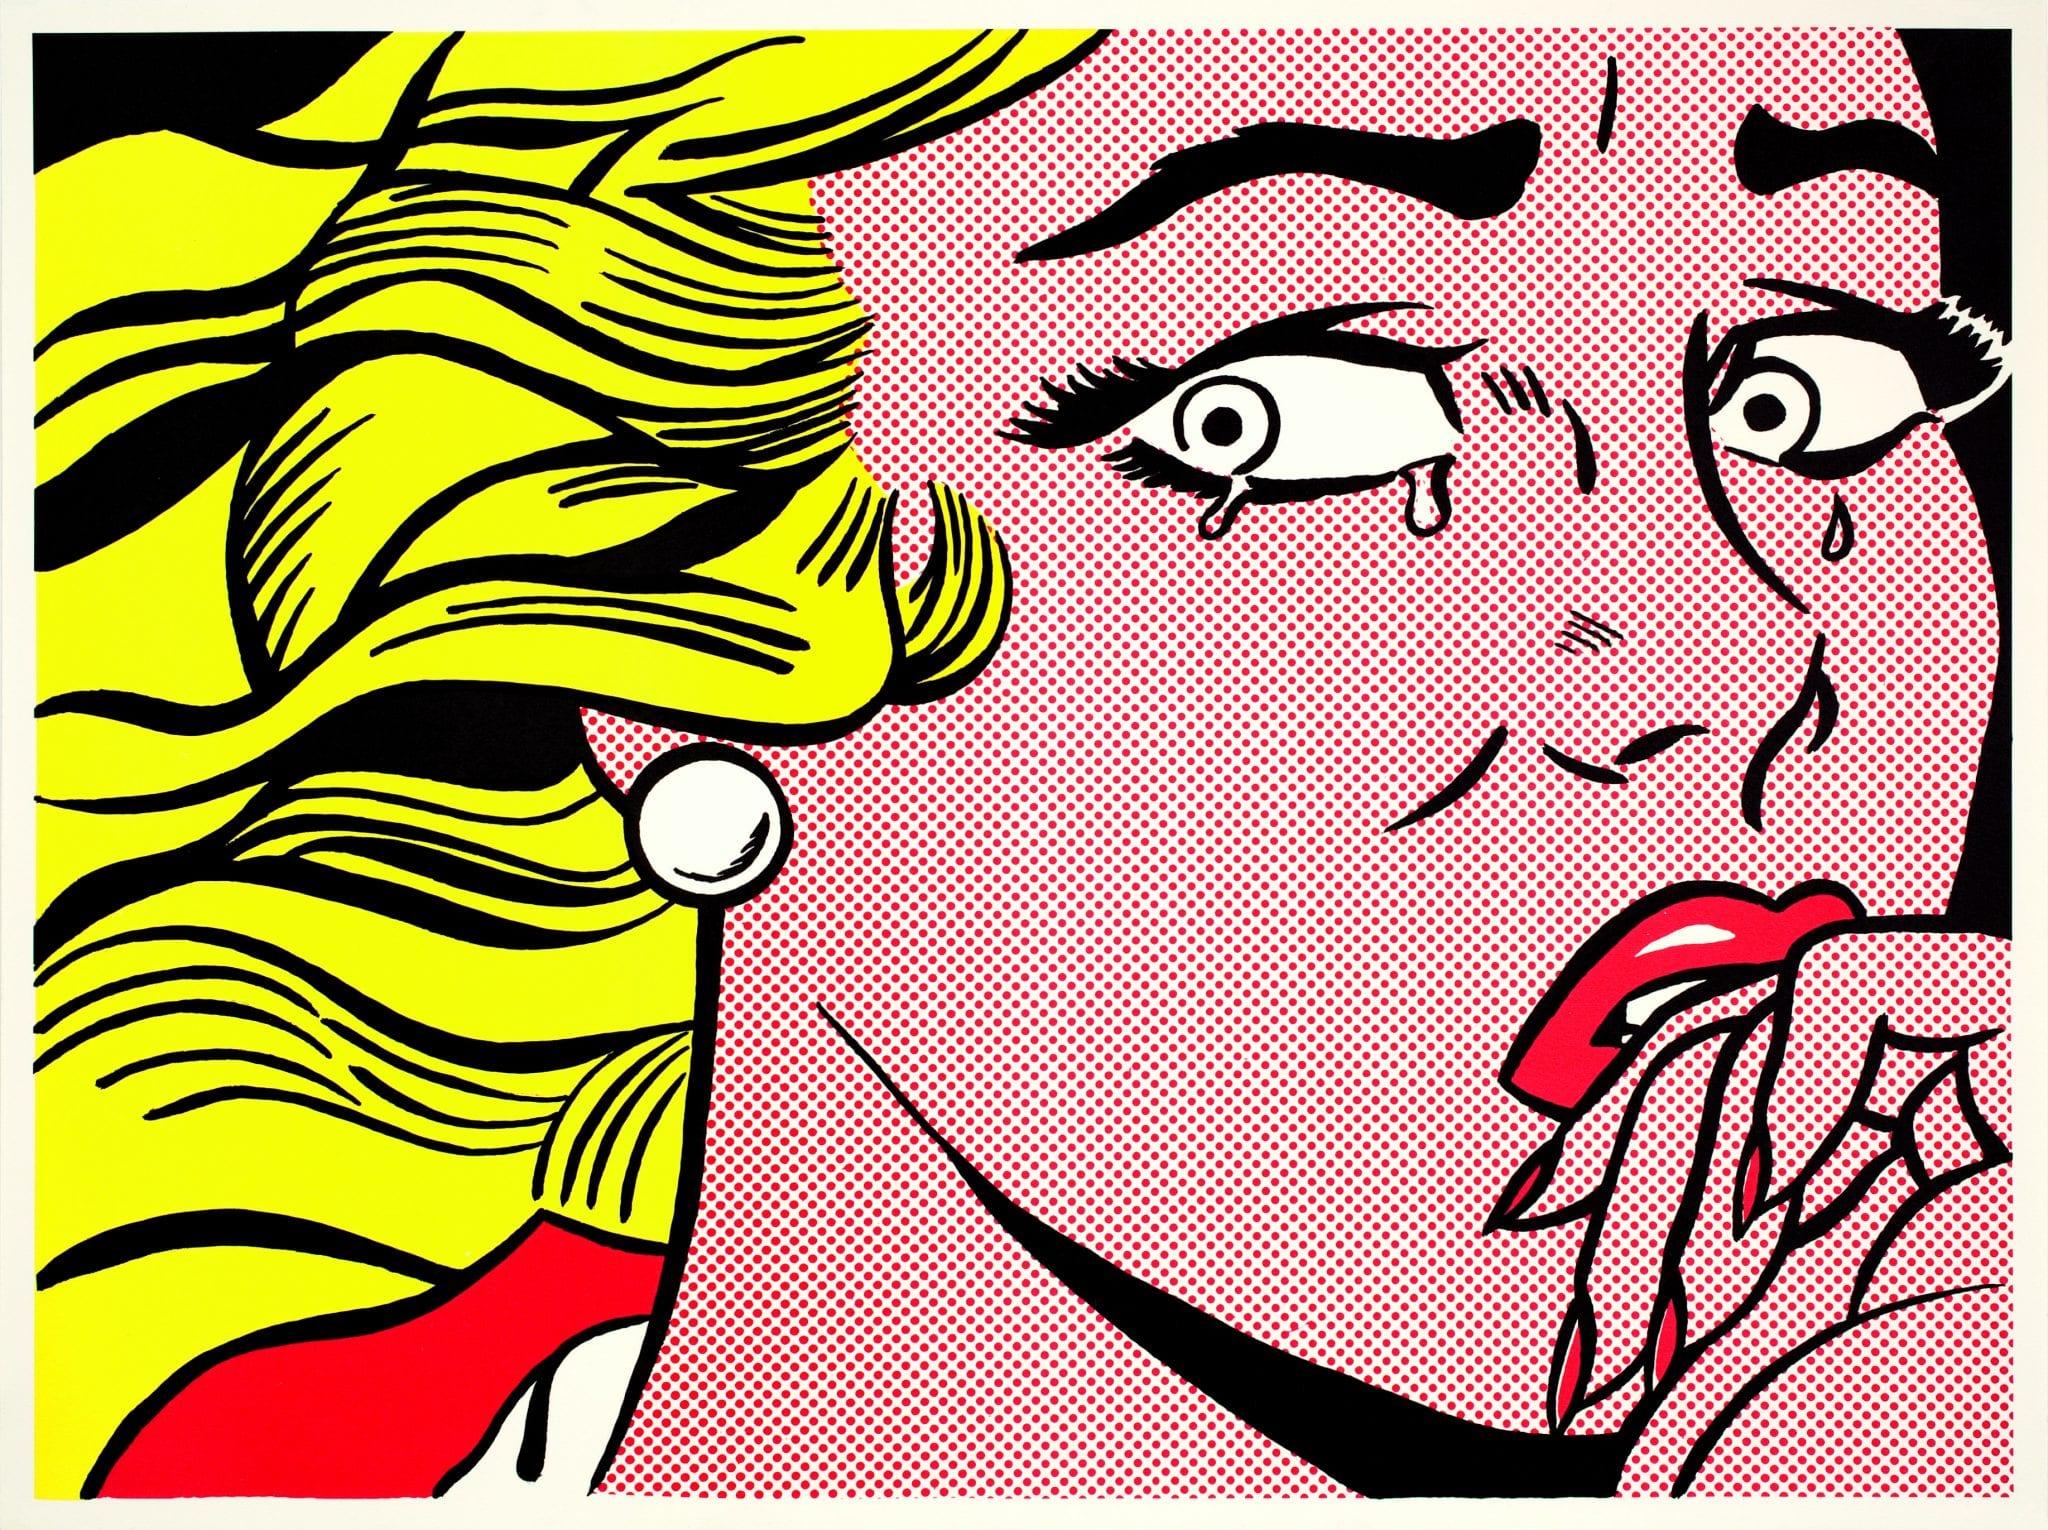 Tra bionde patinate e fumetti benday. L'America di Roy Lichtenstein al Mudec di Milano